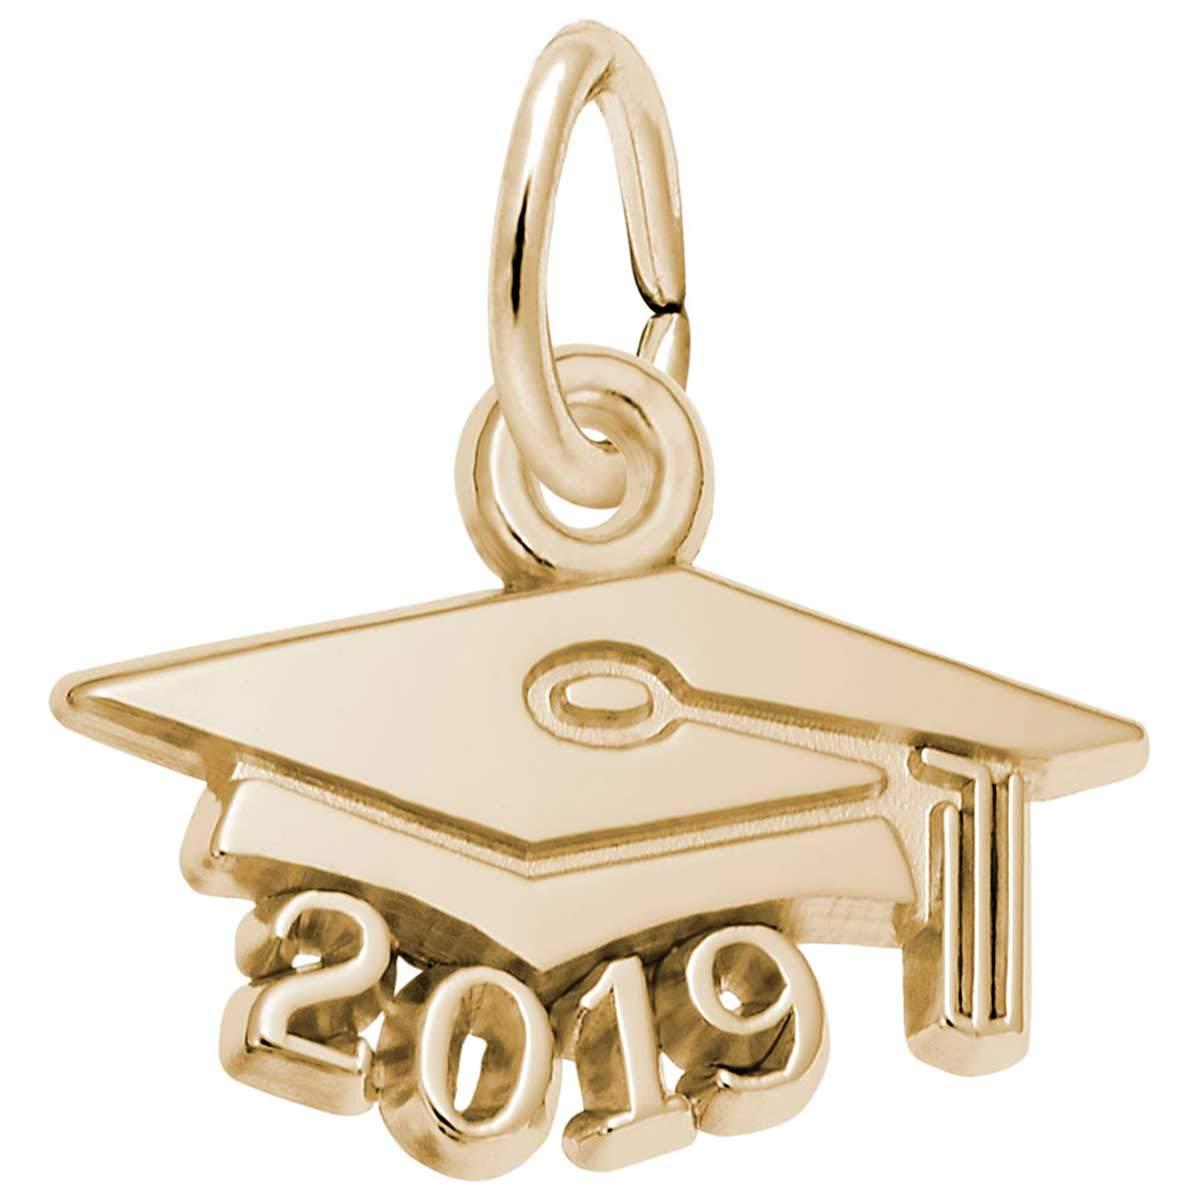 Rembrandt Graduation Cap 2019 Charm, 14K Yellow Gold